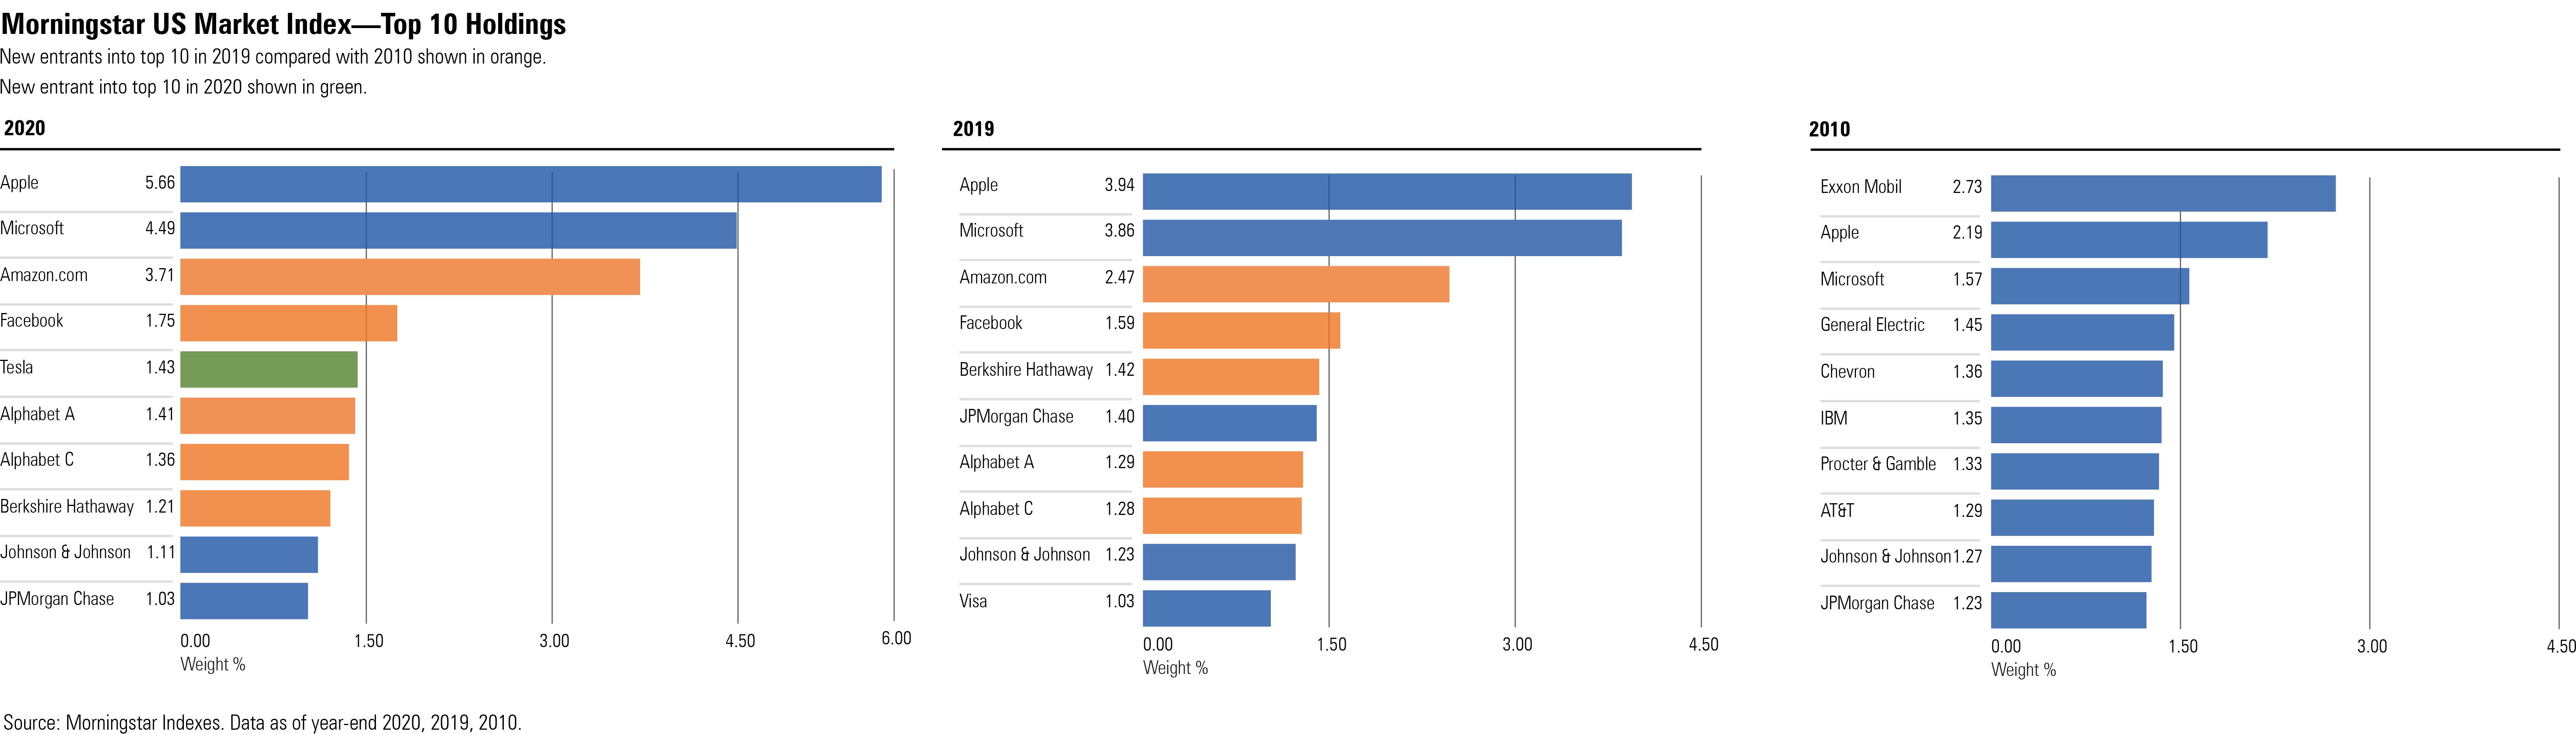 Morningstar US Market index - sector weights